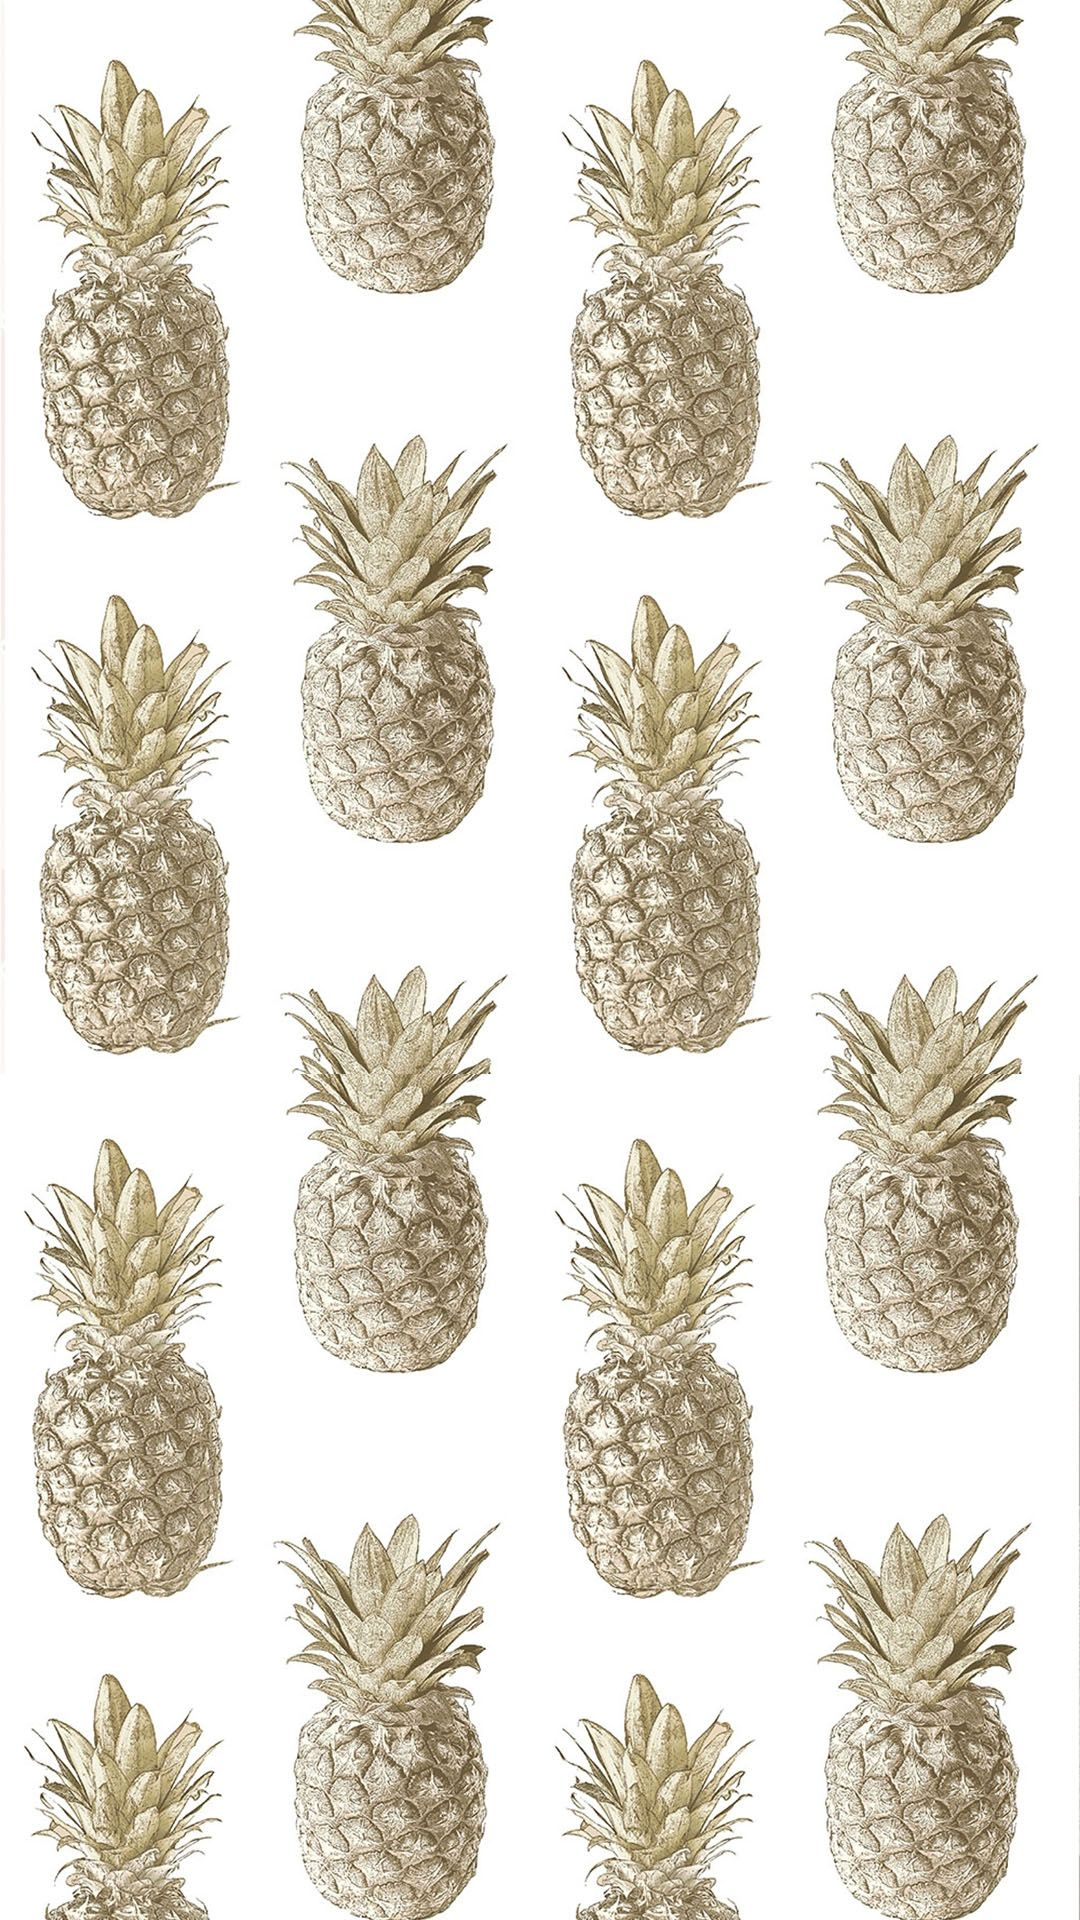 Calypso Pineapples Motif Wallpaper Cream Gold Wallpaper